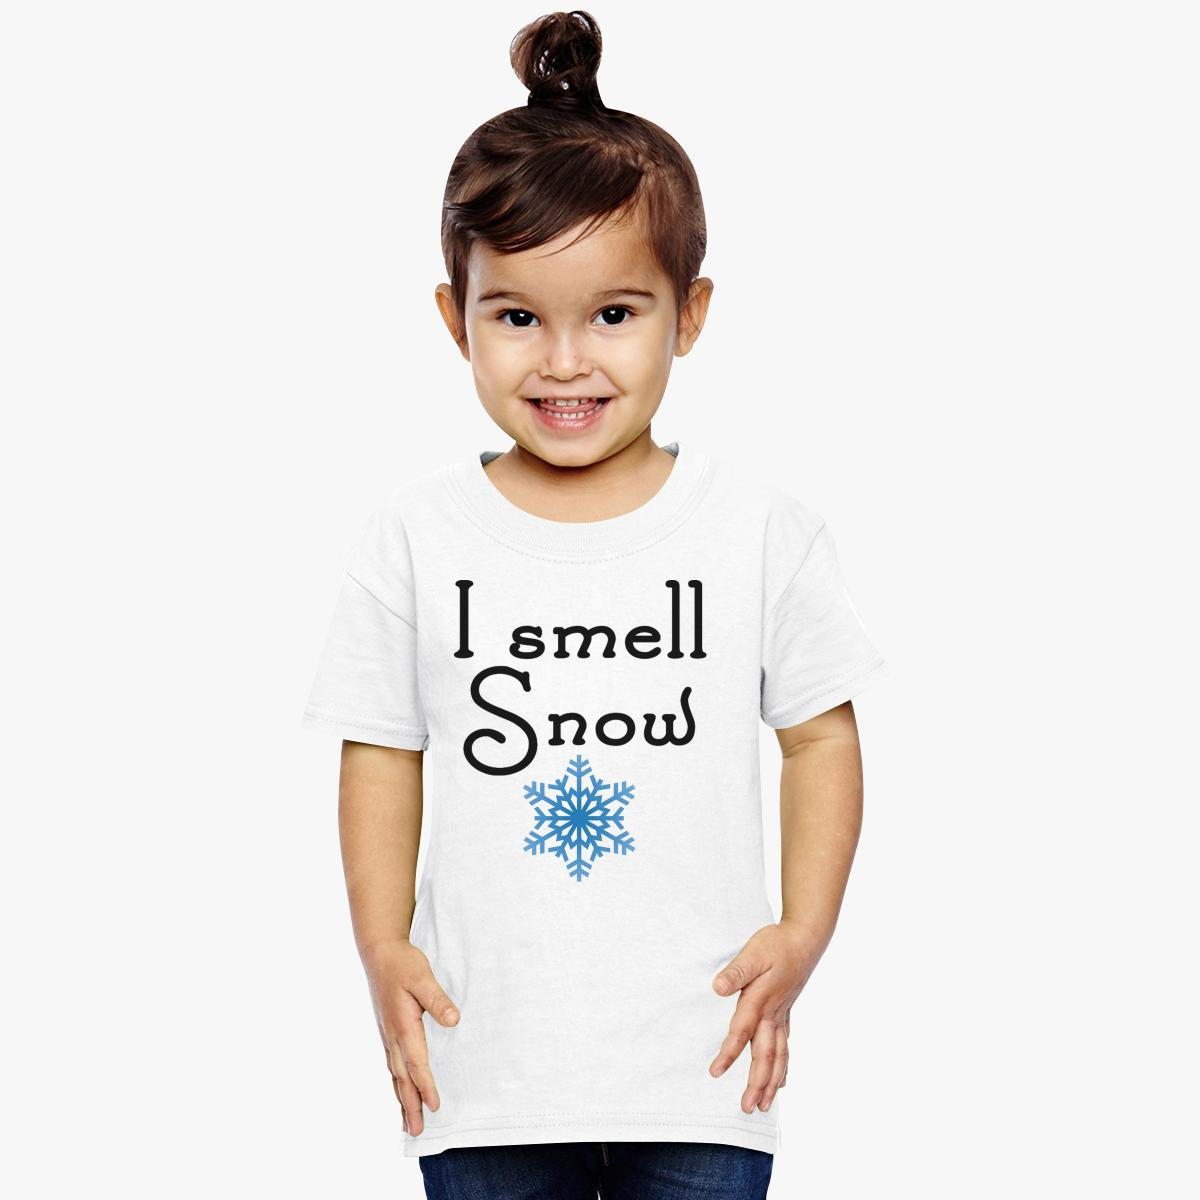 Gilmore Girls - I smell Snow  Toddler T-shirt